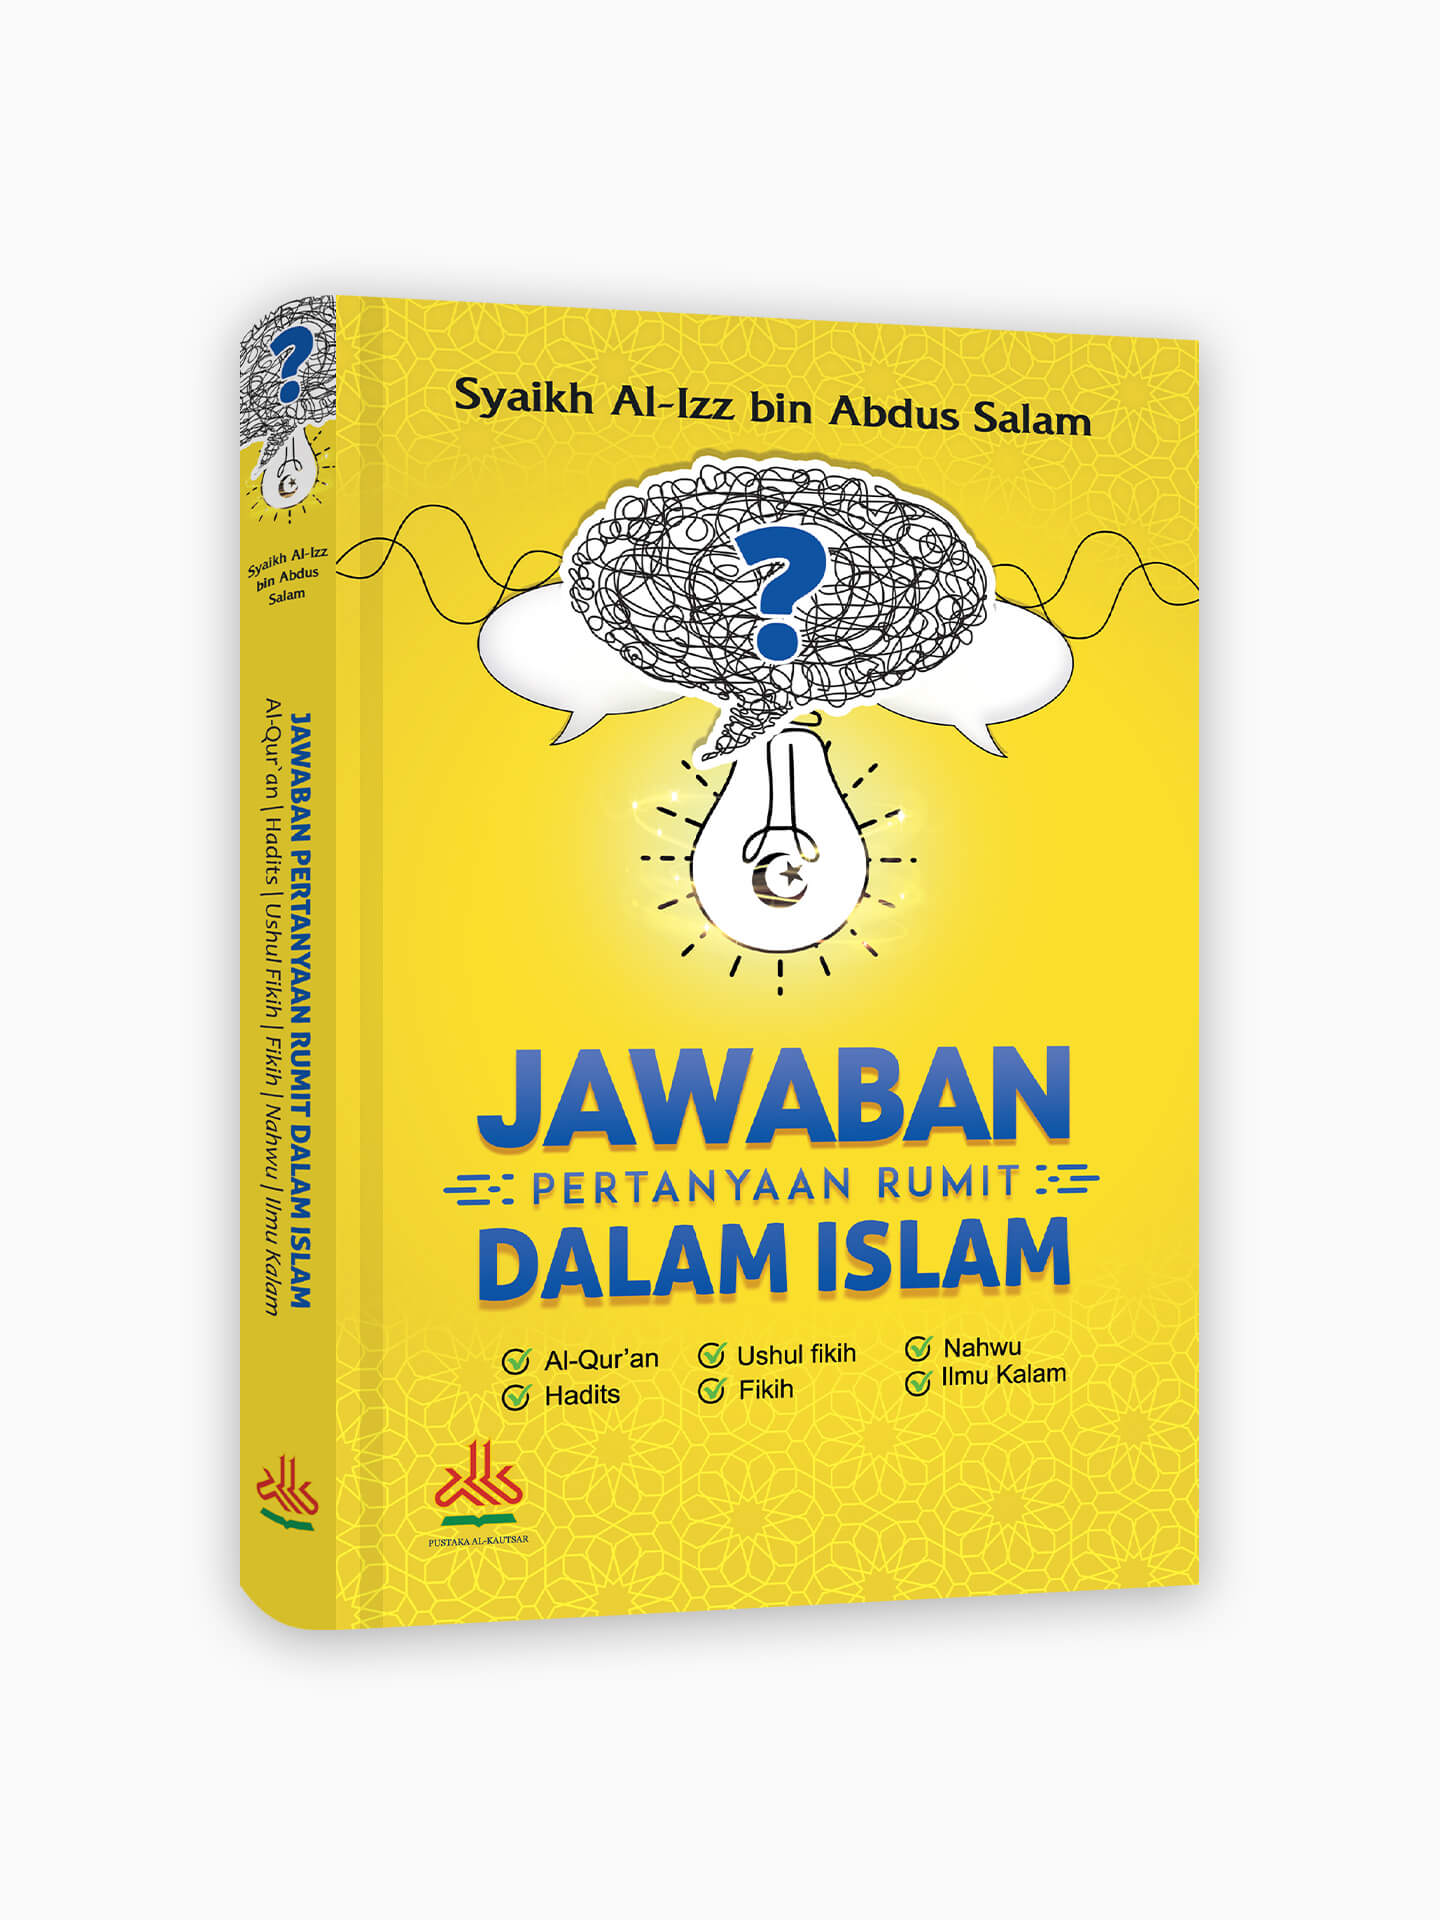 Jawaban Pertanyaan Rumit Dalam Islam